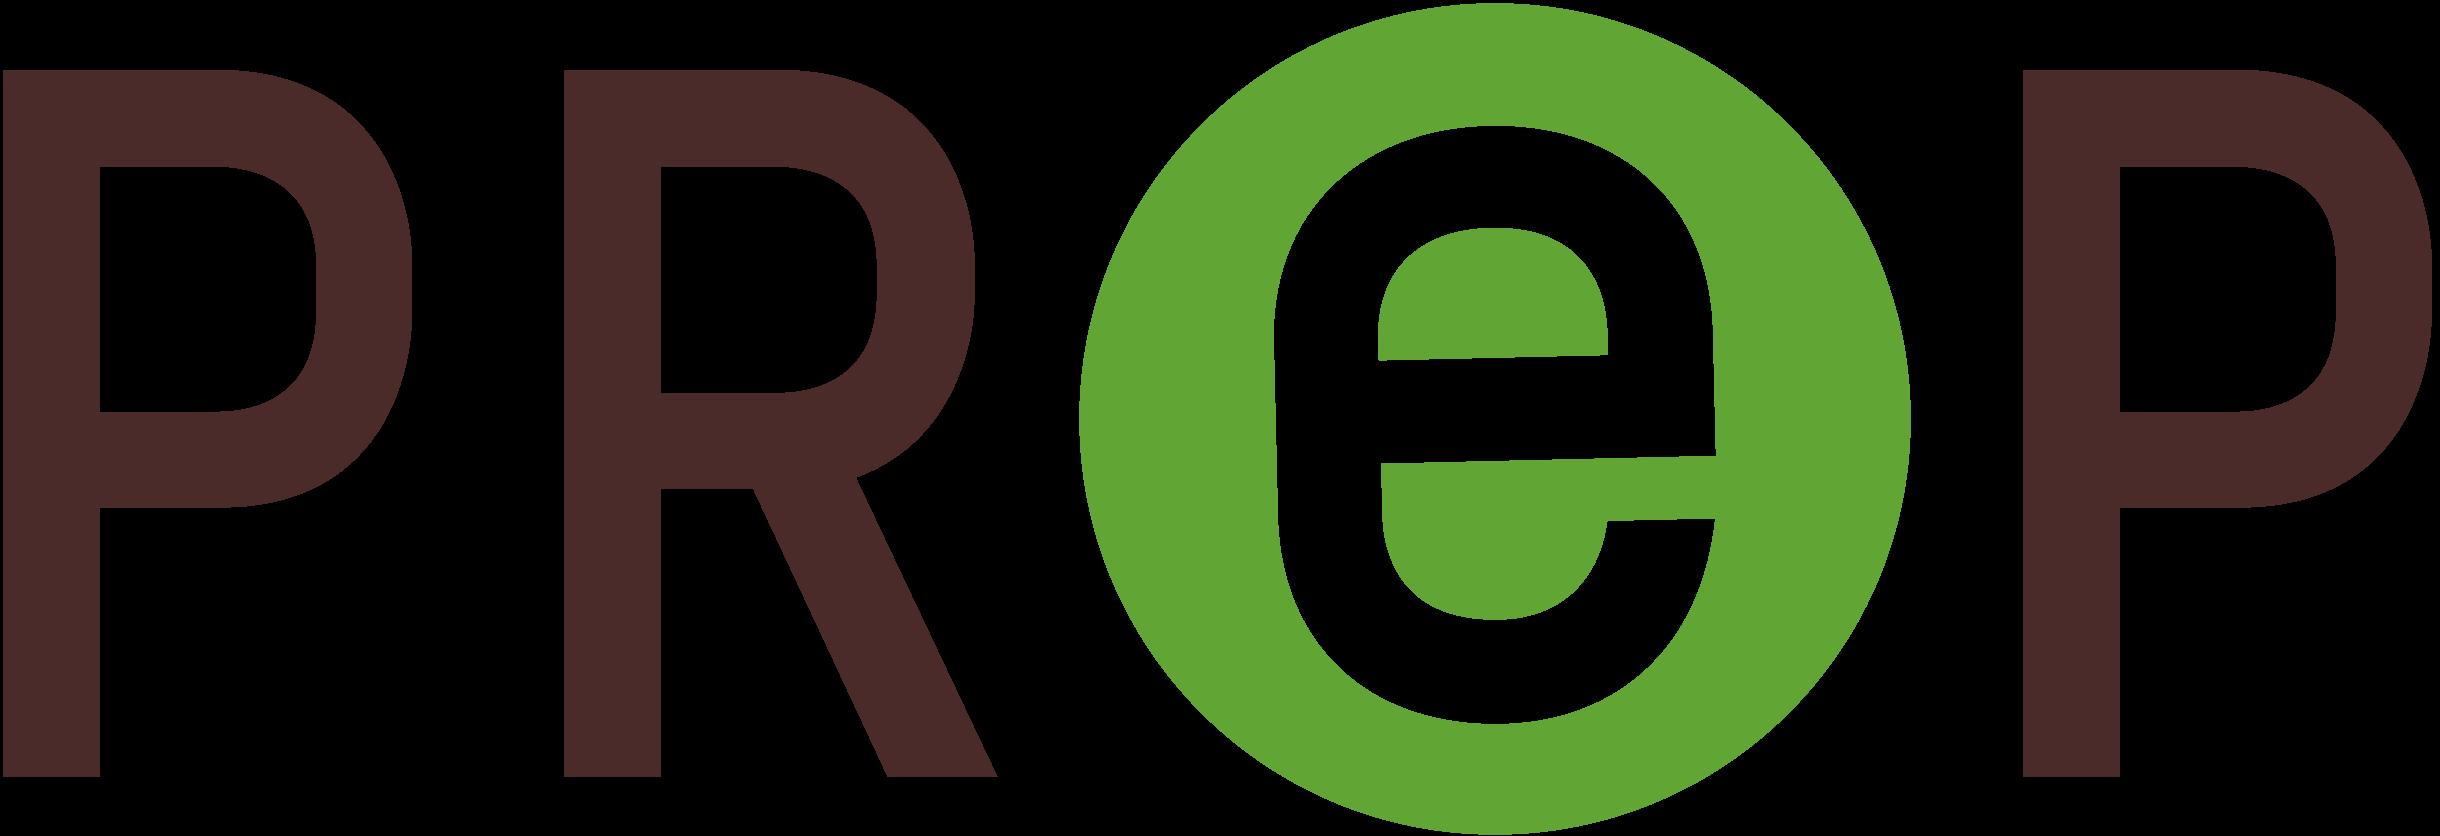 prep-logo-rgb-notag-oxfam-america-1109083.png (2440×836)